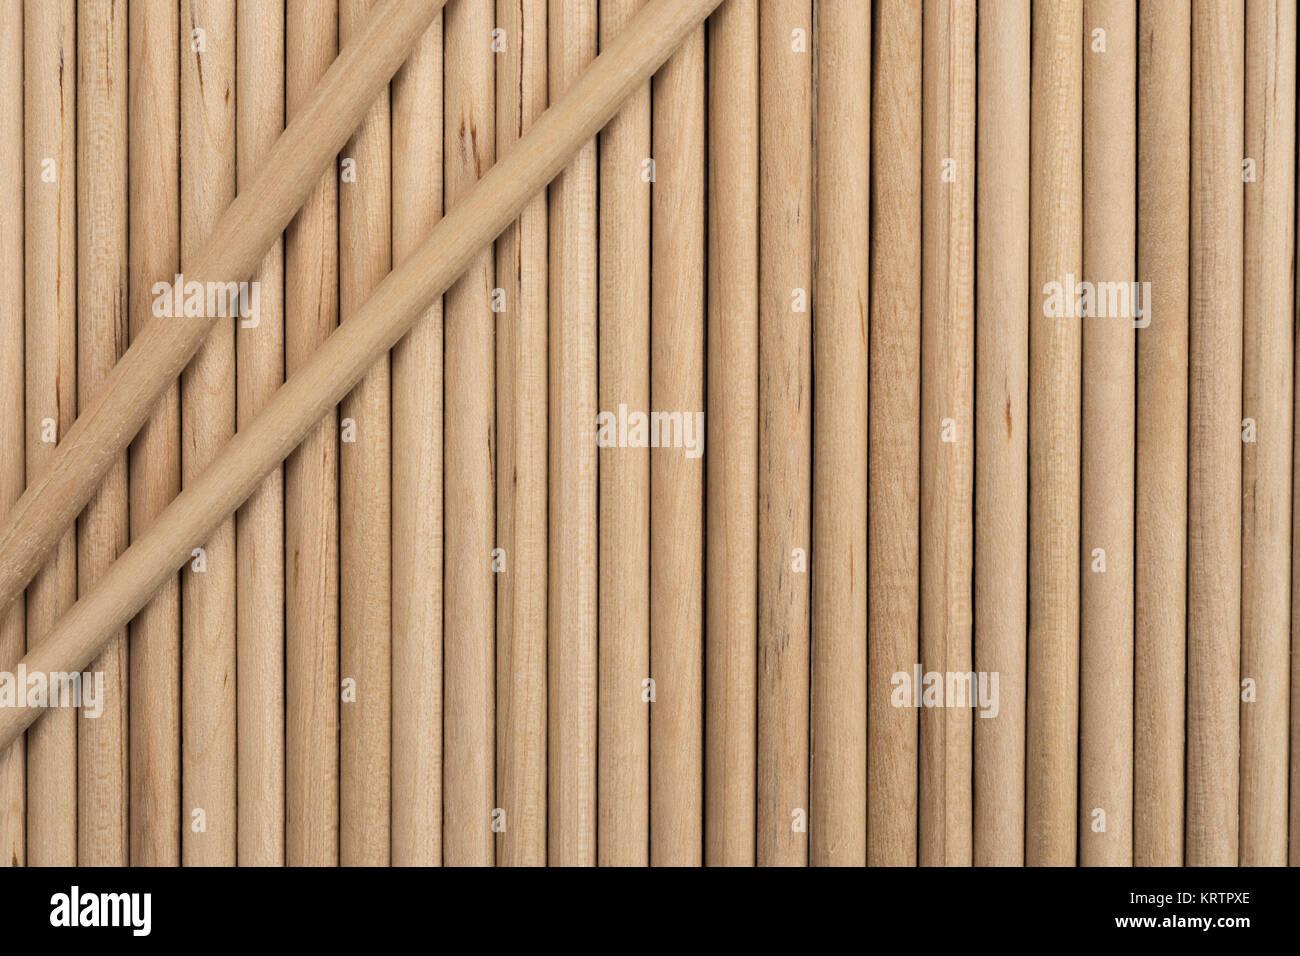 Close-up of wooden lollipop sticks. - Stock Image